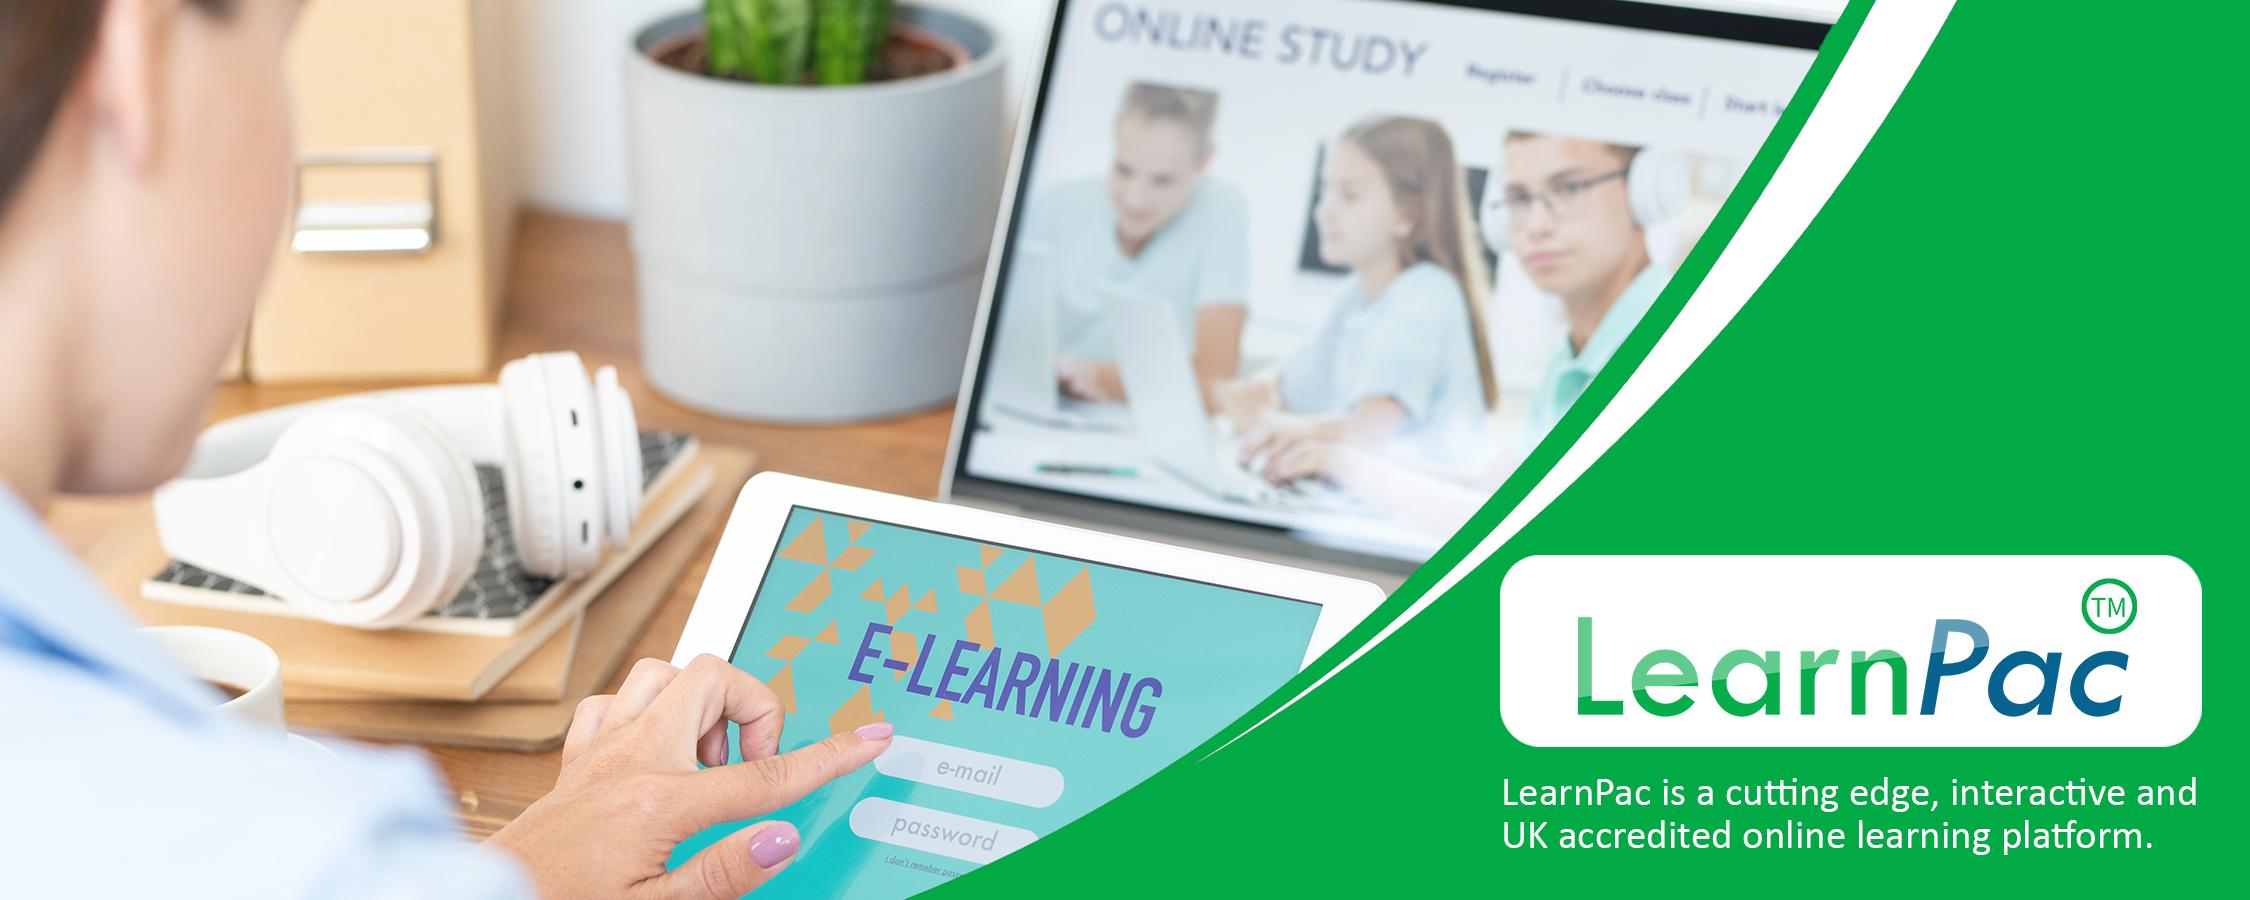 Change Management Training - Online Learning Courses - E-Learning Courses - LearnPac Systems UK -